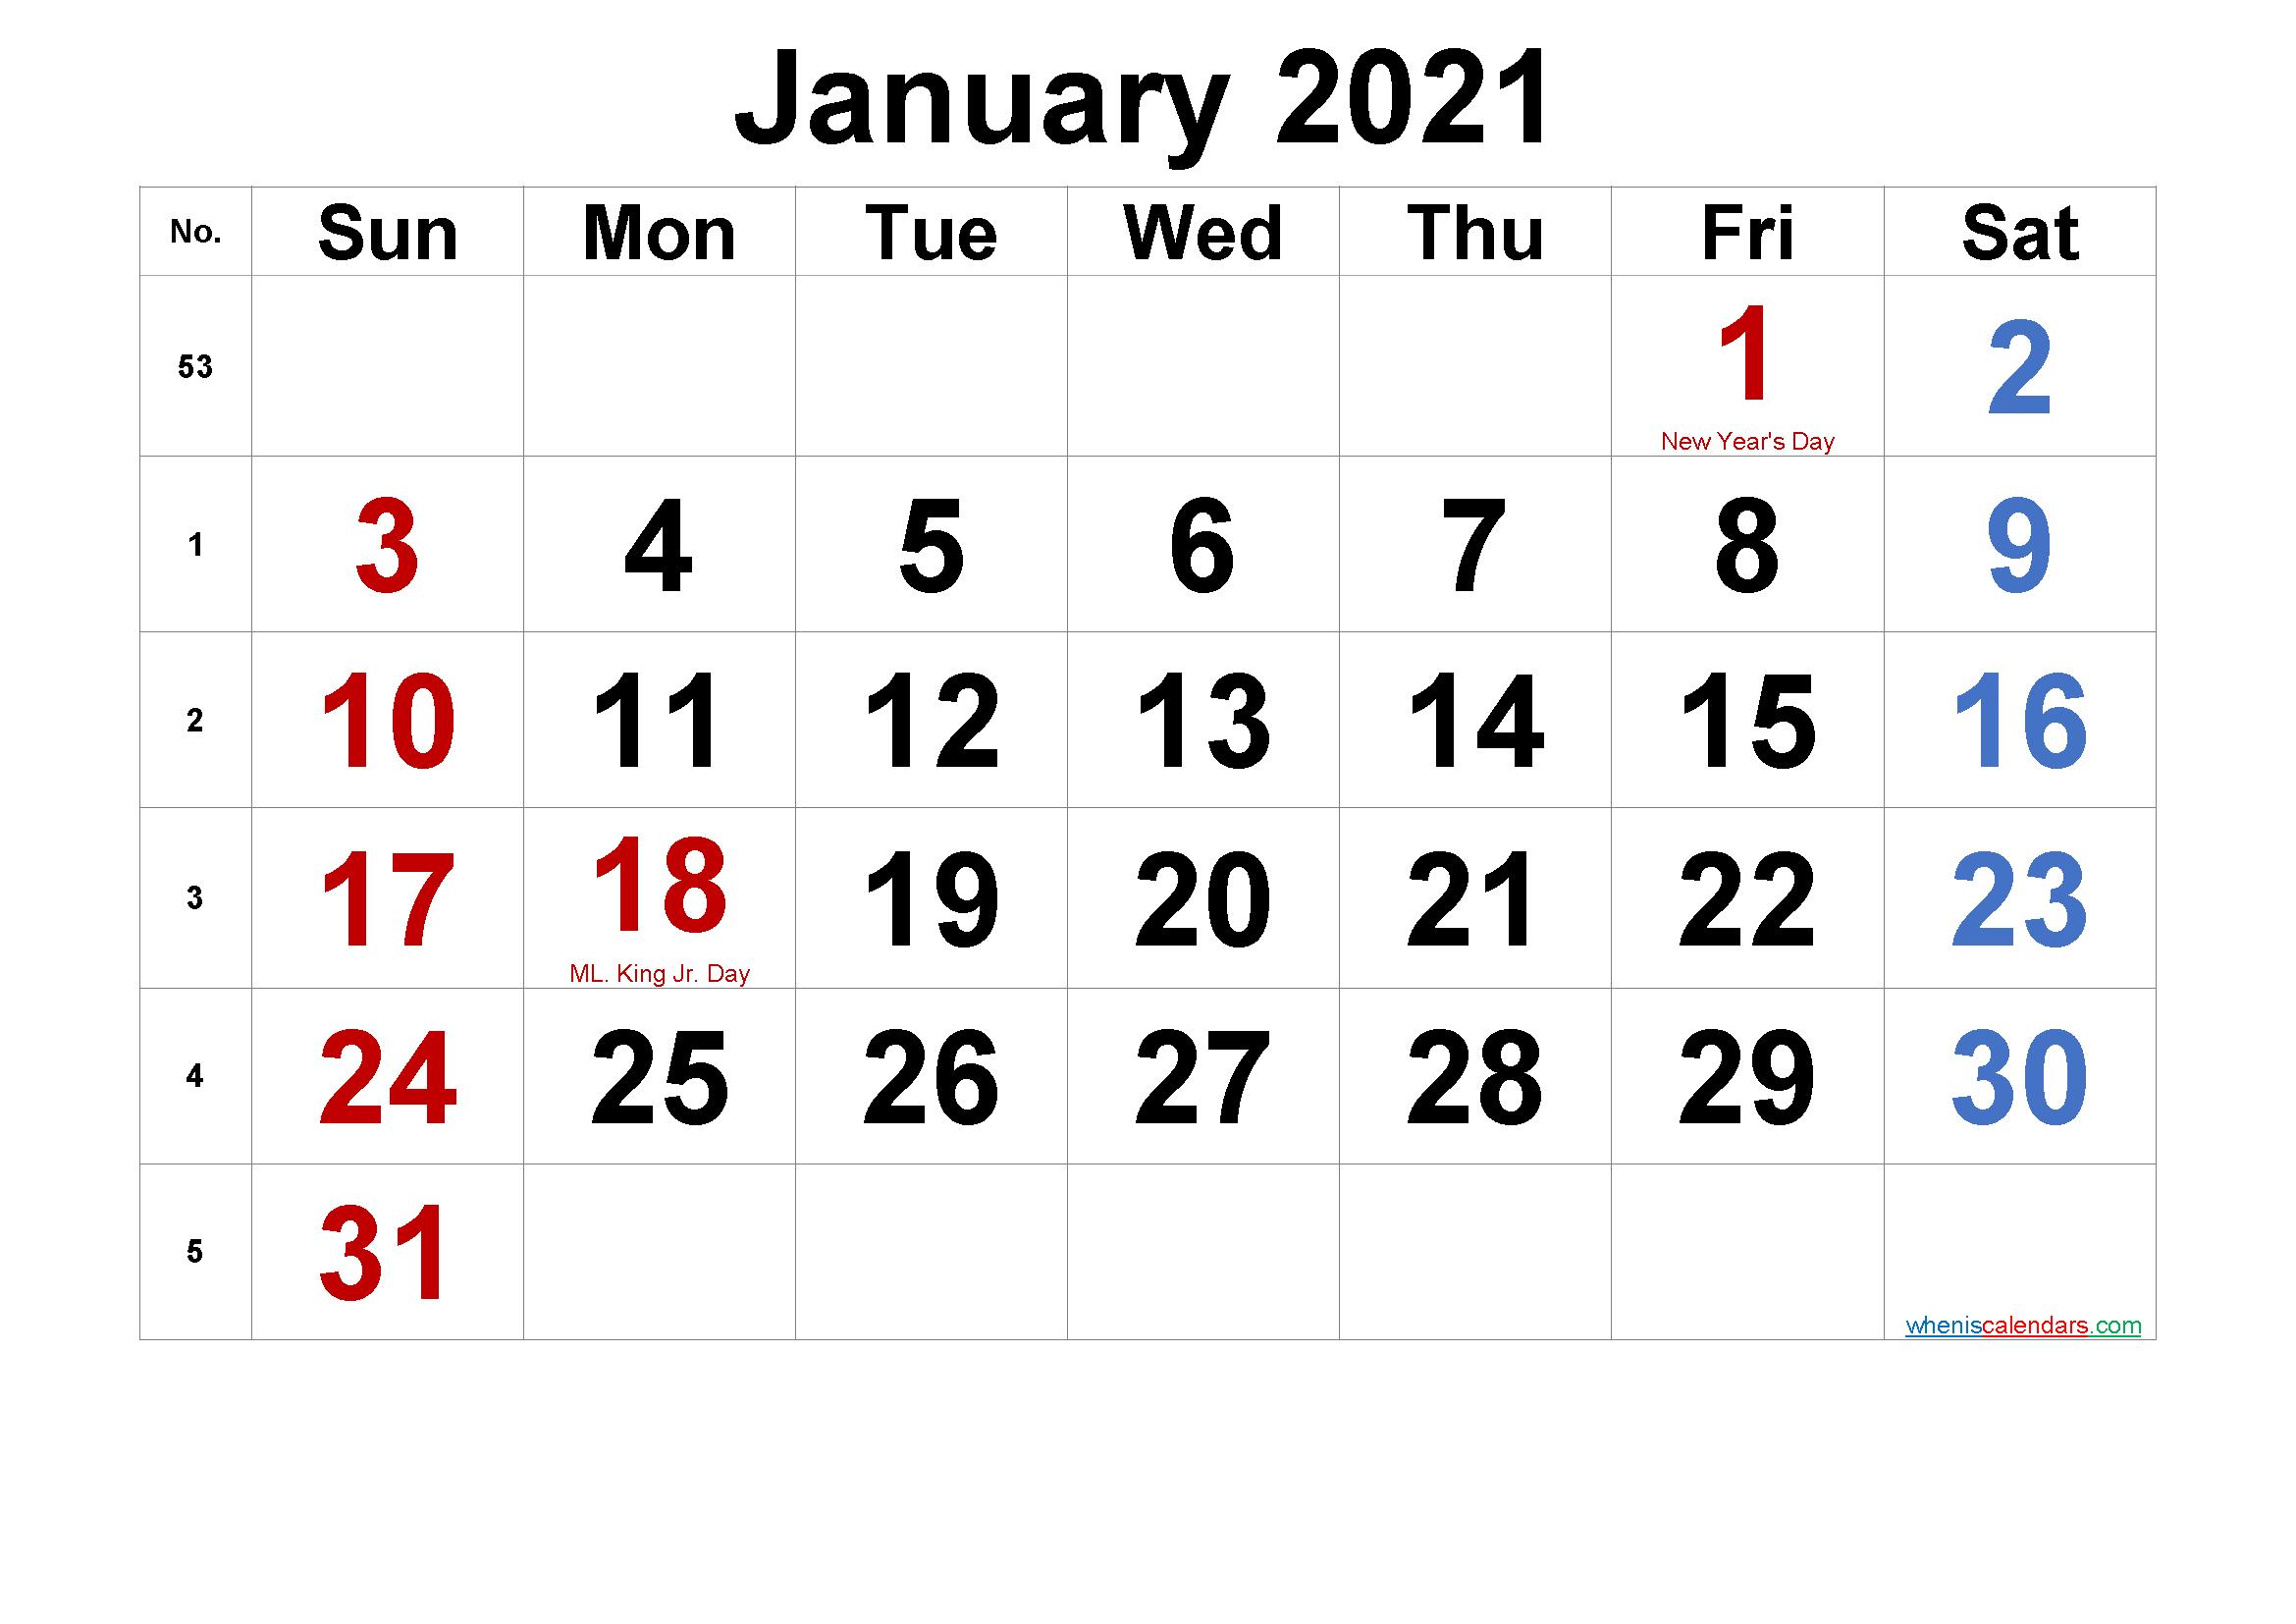 Free Printable January 2021 Calendar With Holidays